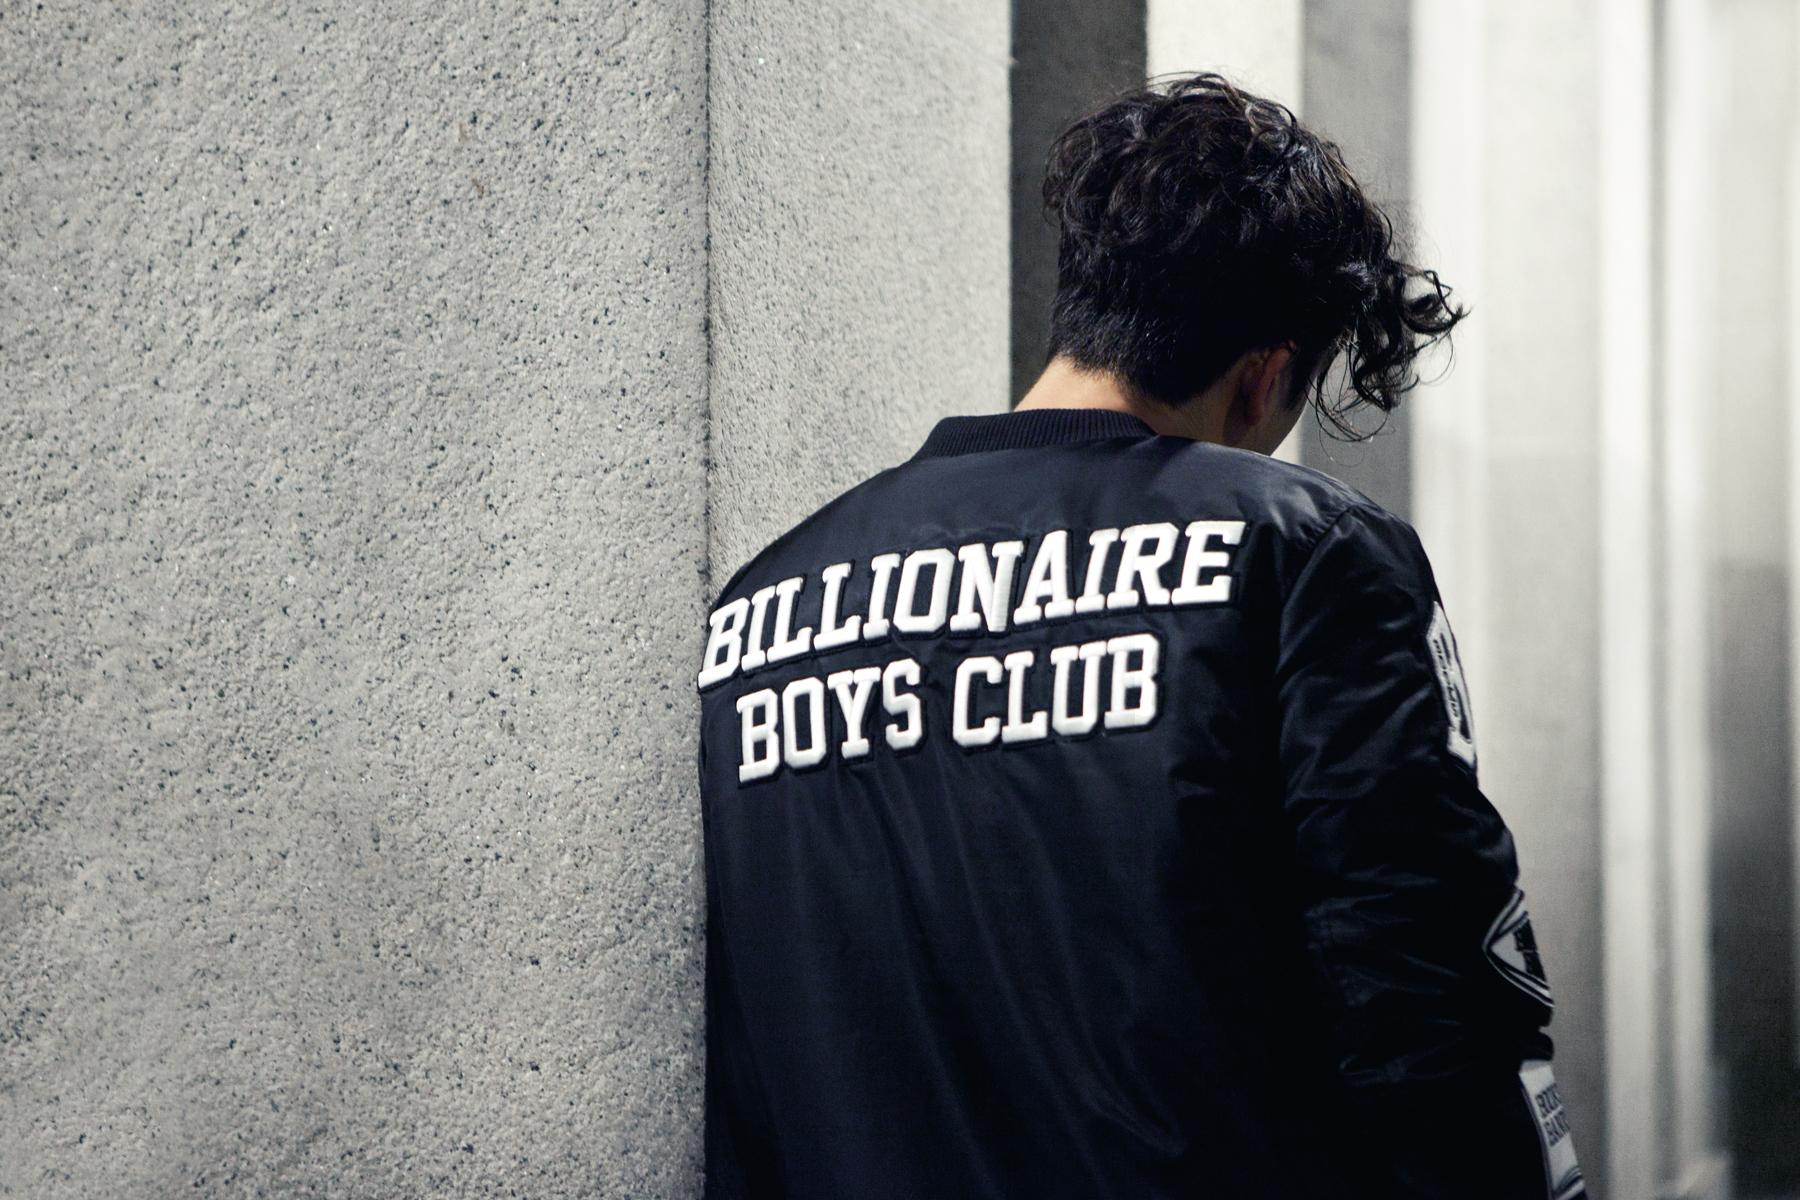 Billionaire Boys Club 2015 Fall/Winter New Arrivals